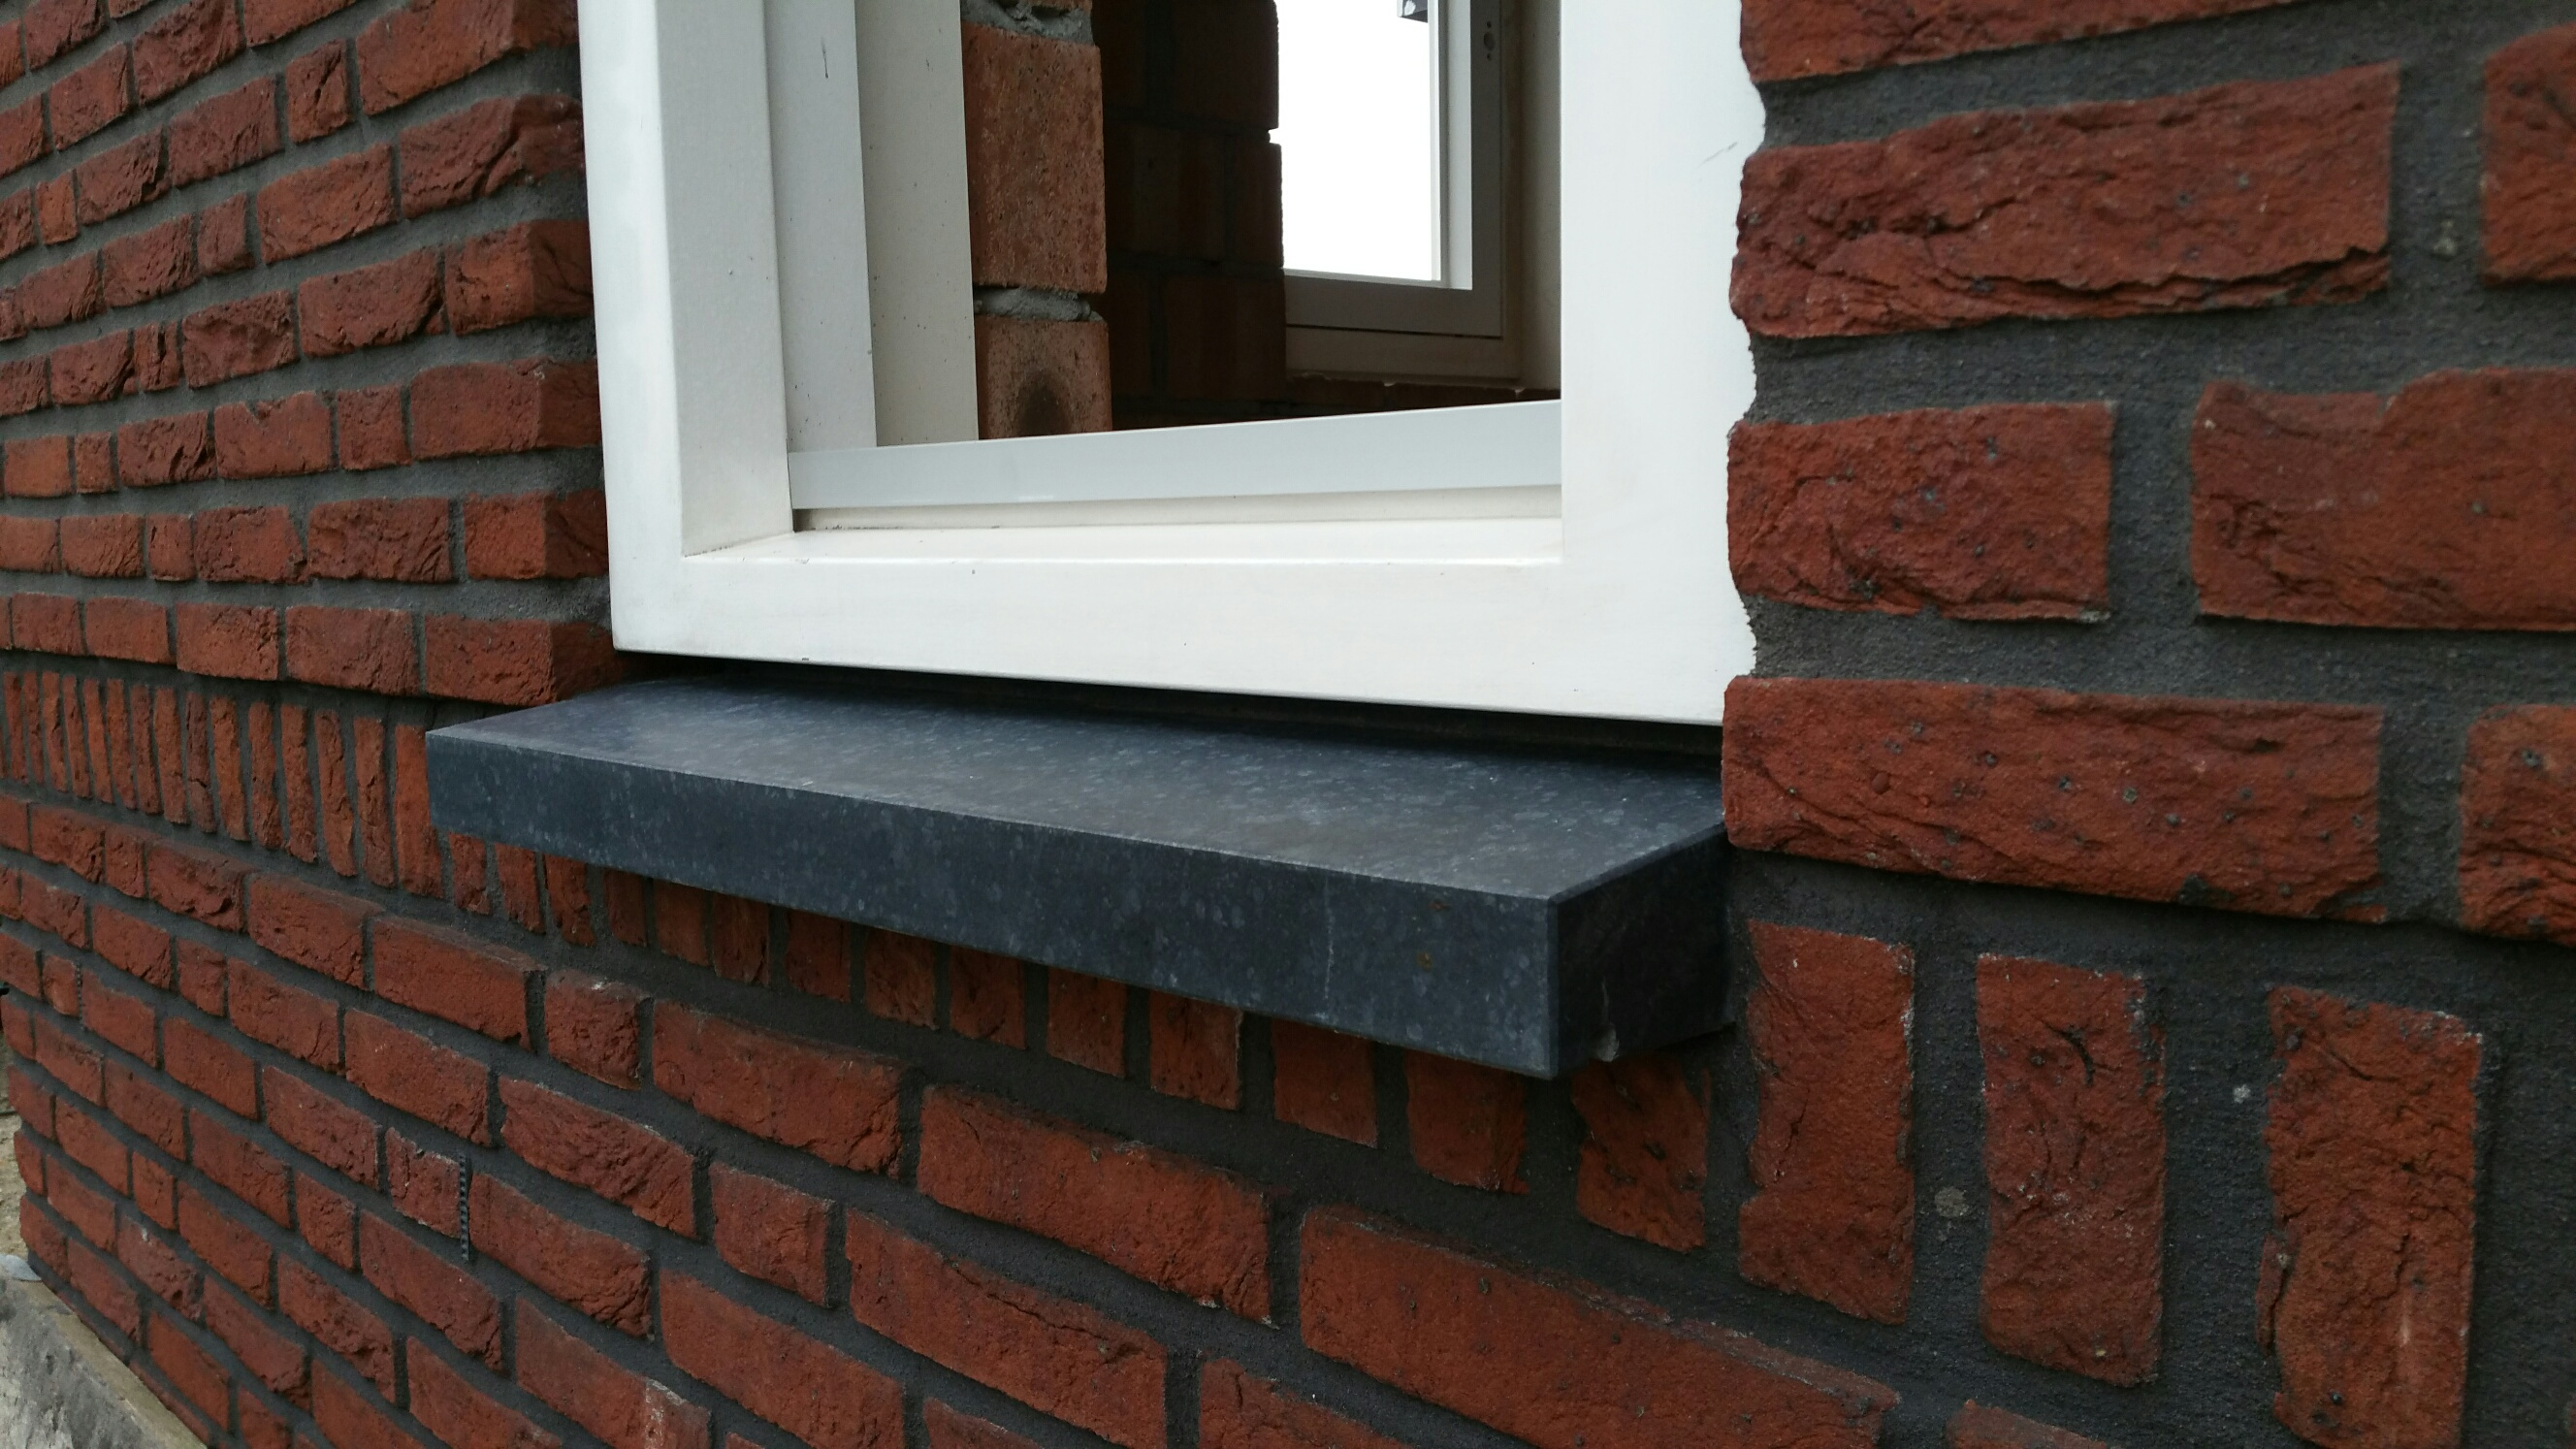 Basalt raam- en deurdorpels voor nieuwbouwhuis Zeeland